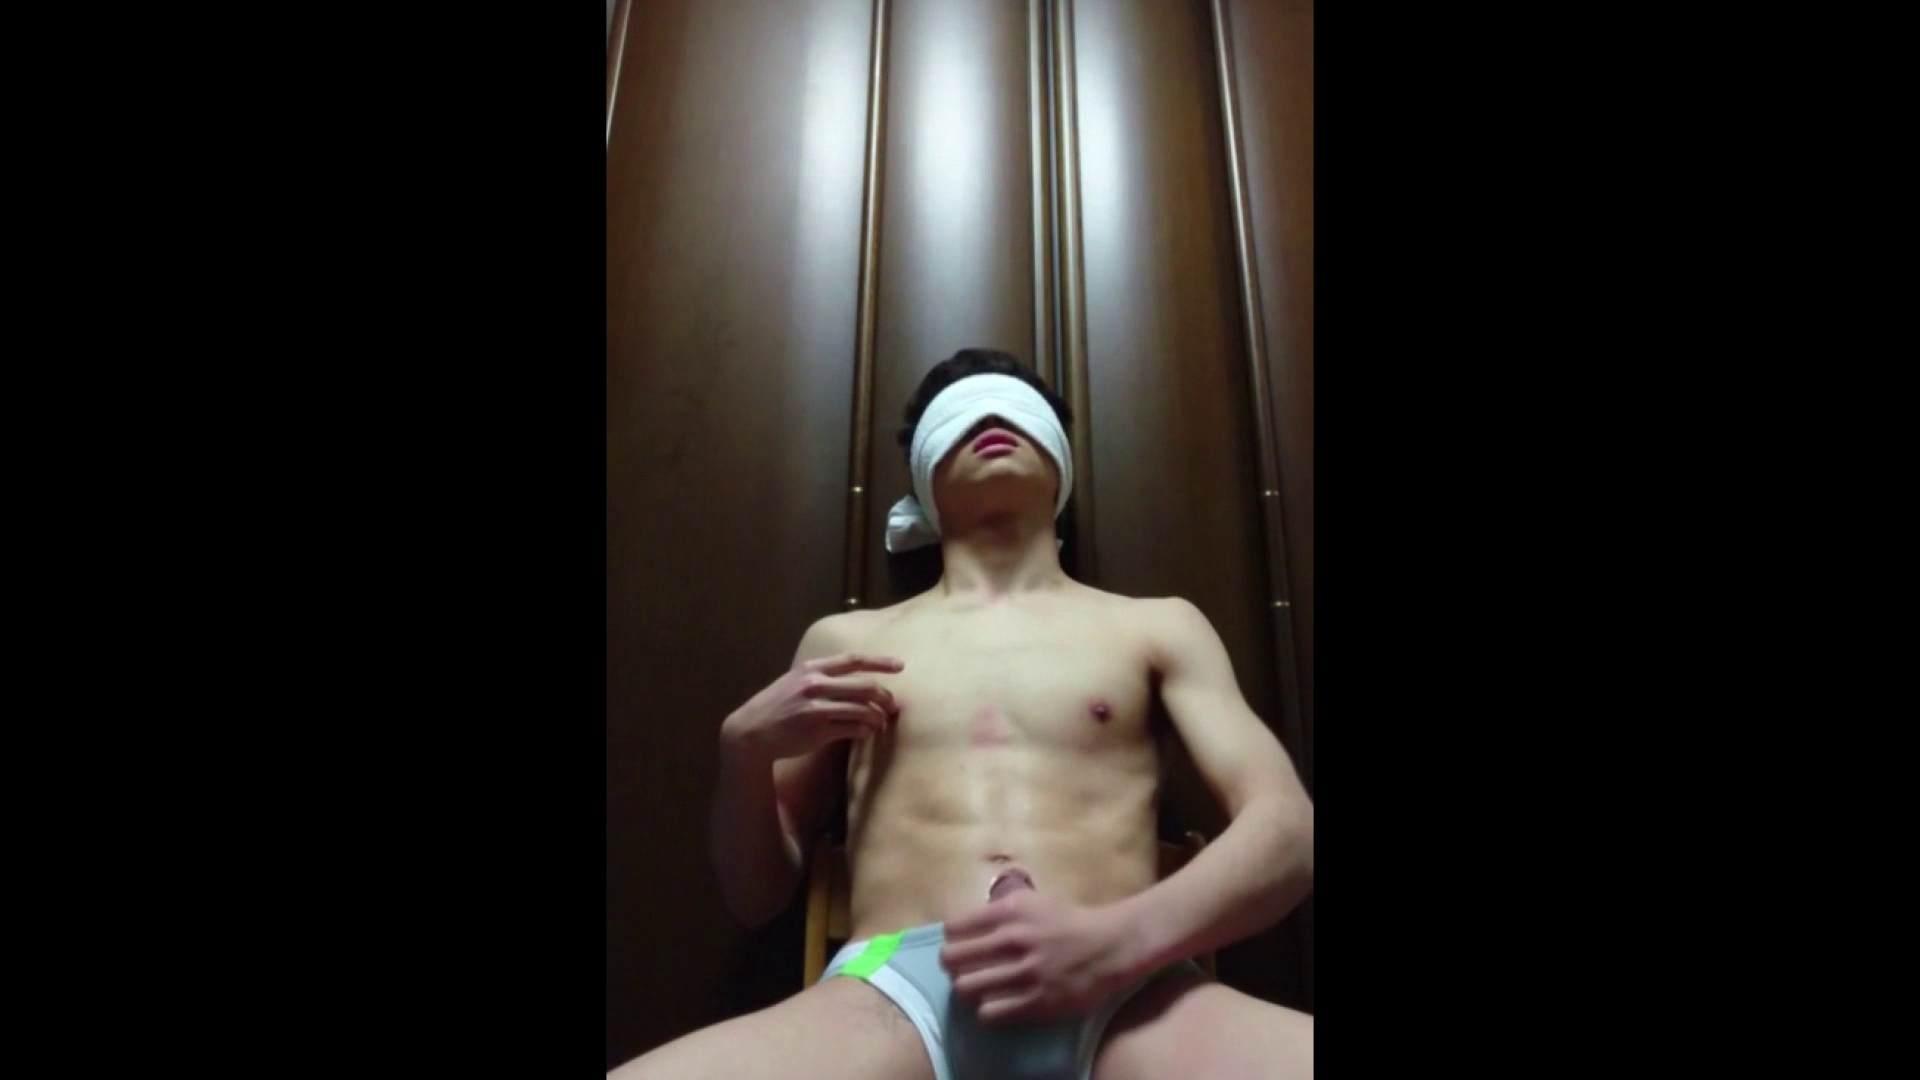 個人撮影 自慰の極意 Vol.21 無修正 男同士動画 93pic 88